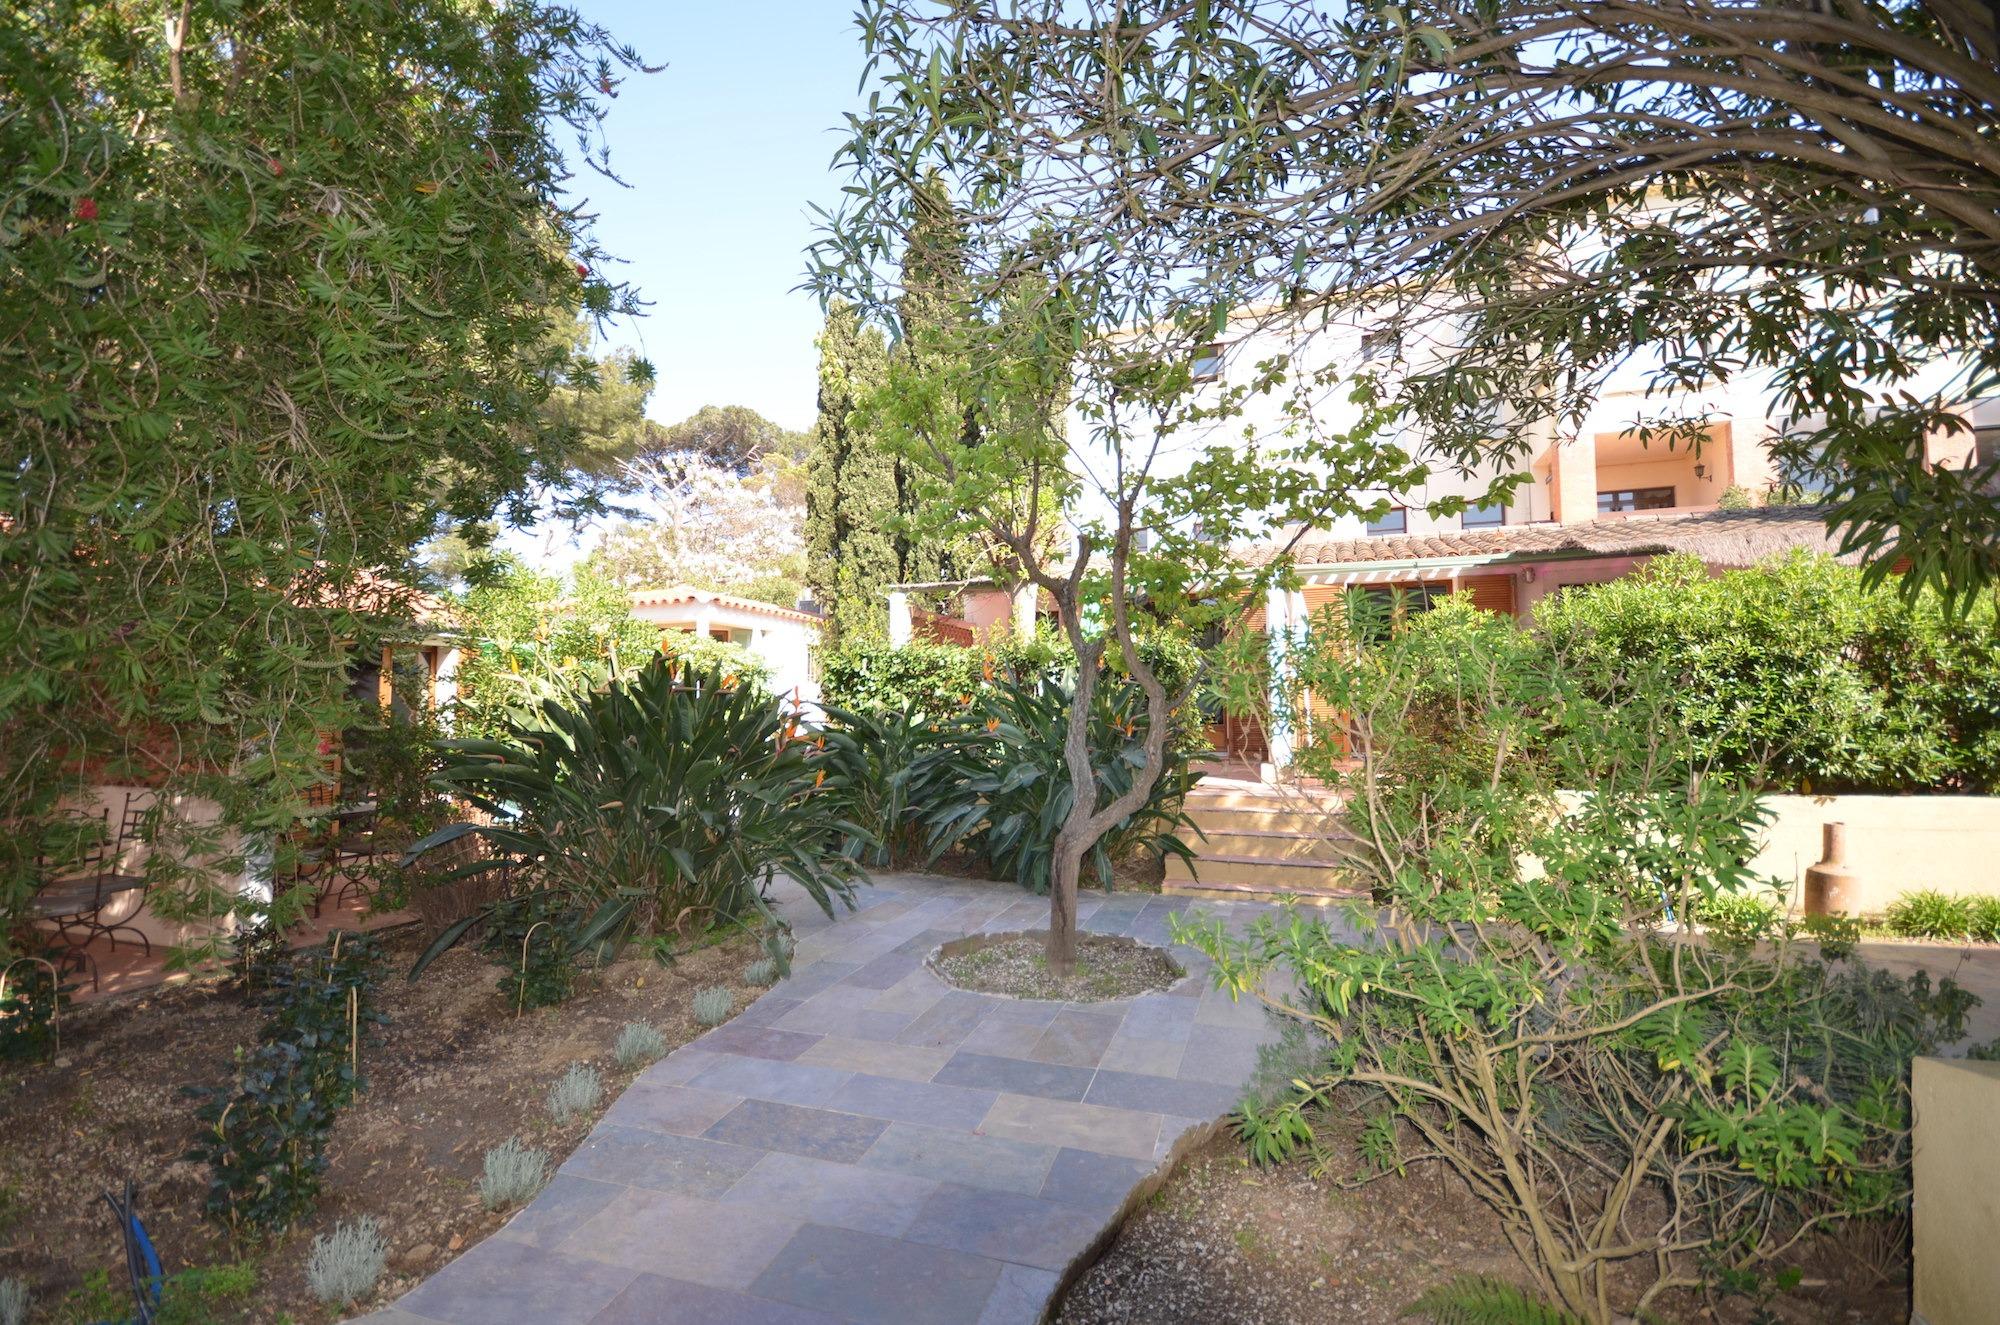 Jardin de la résidence du Village - Le Clos des Galéjades Porquerolles